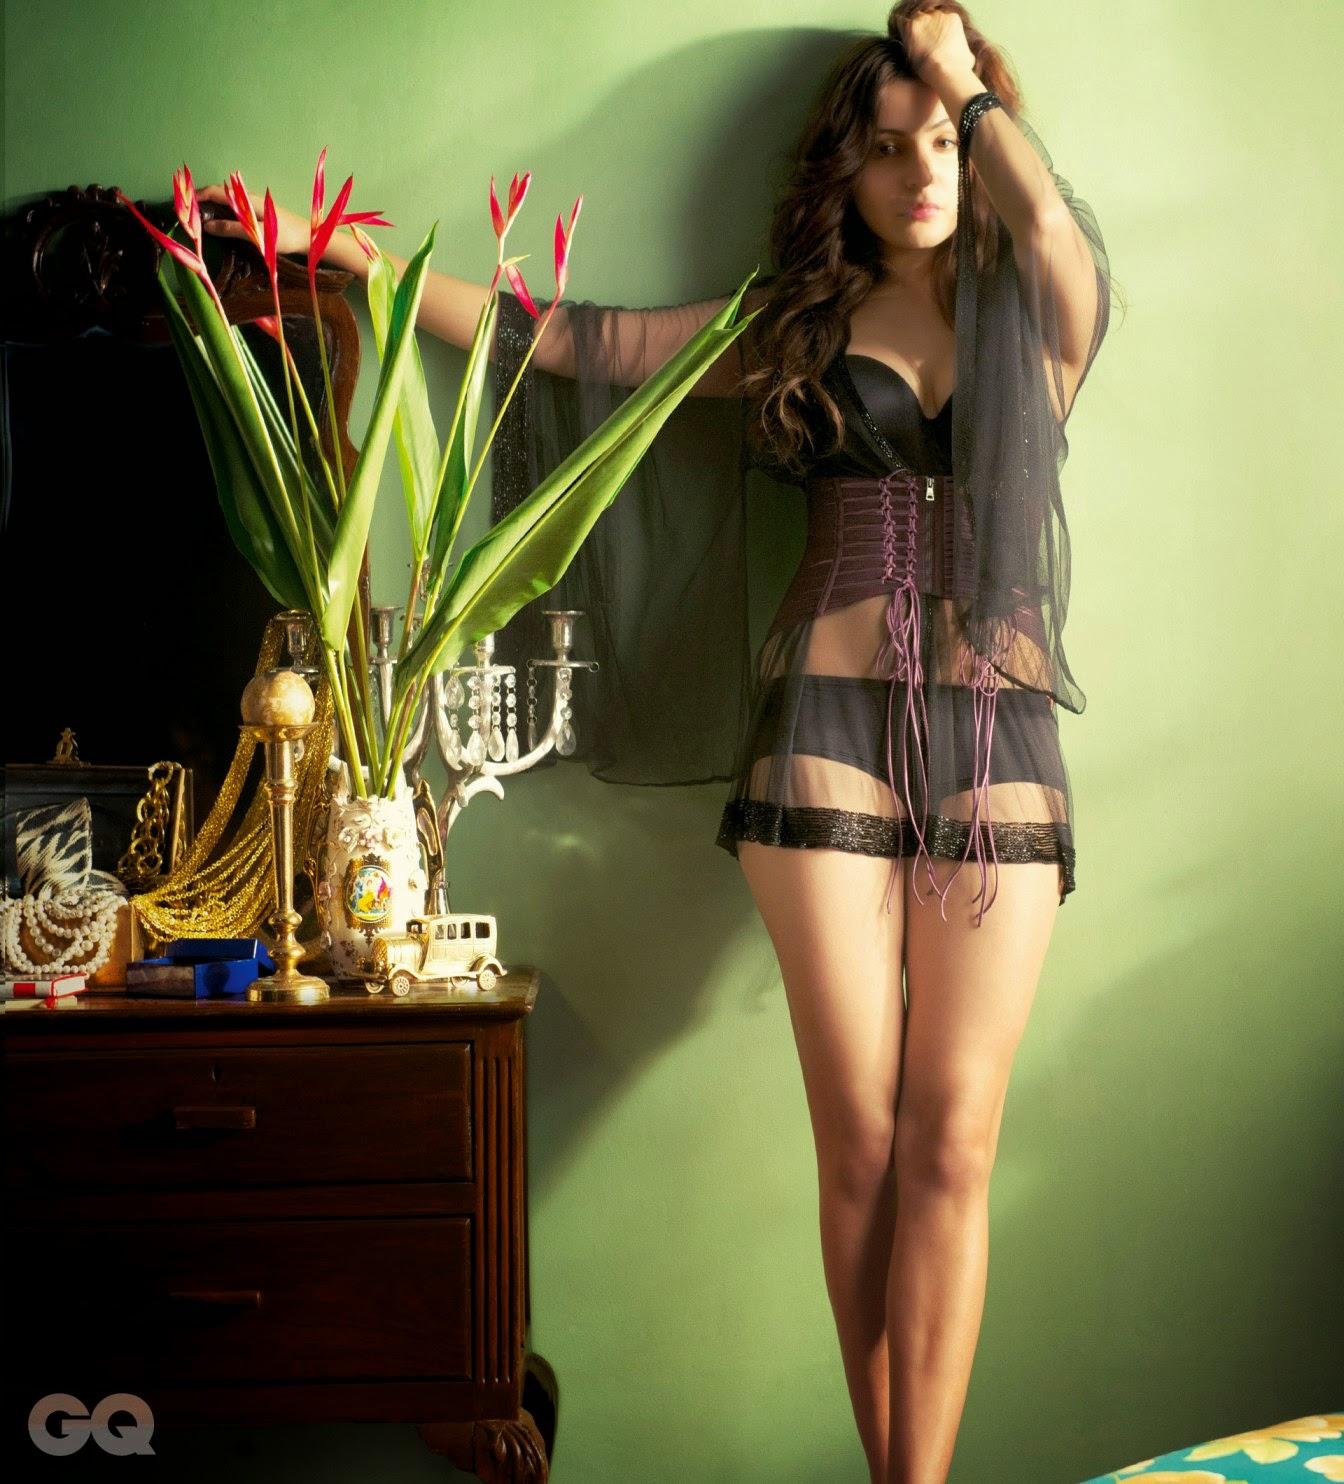 Anushka Sharma Looking Smoking Hot in Sexy Lingerie